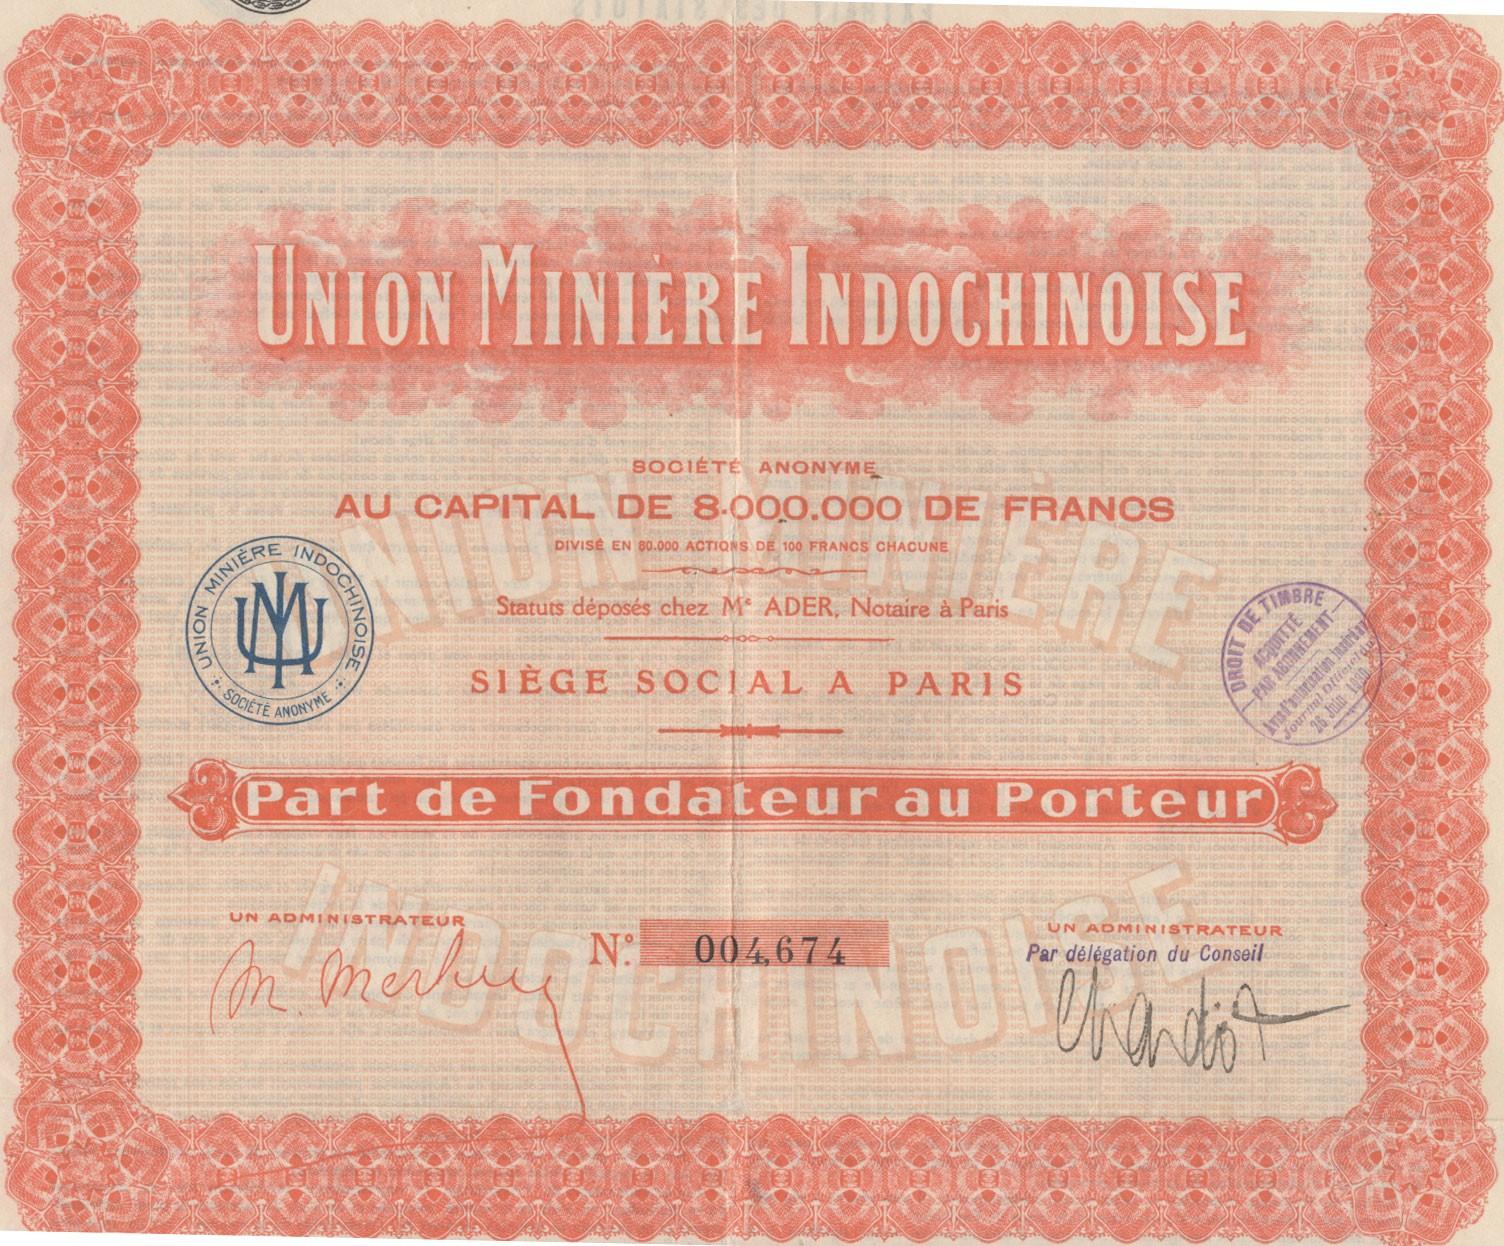 Union Minière Indochinoise INDOCHINE N